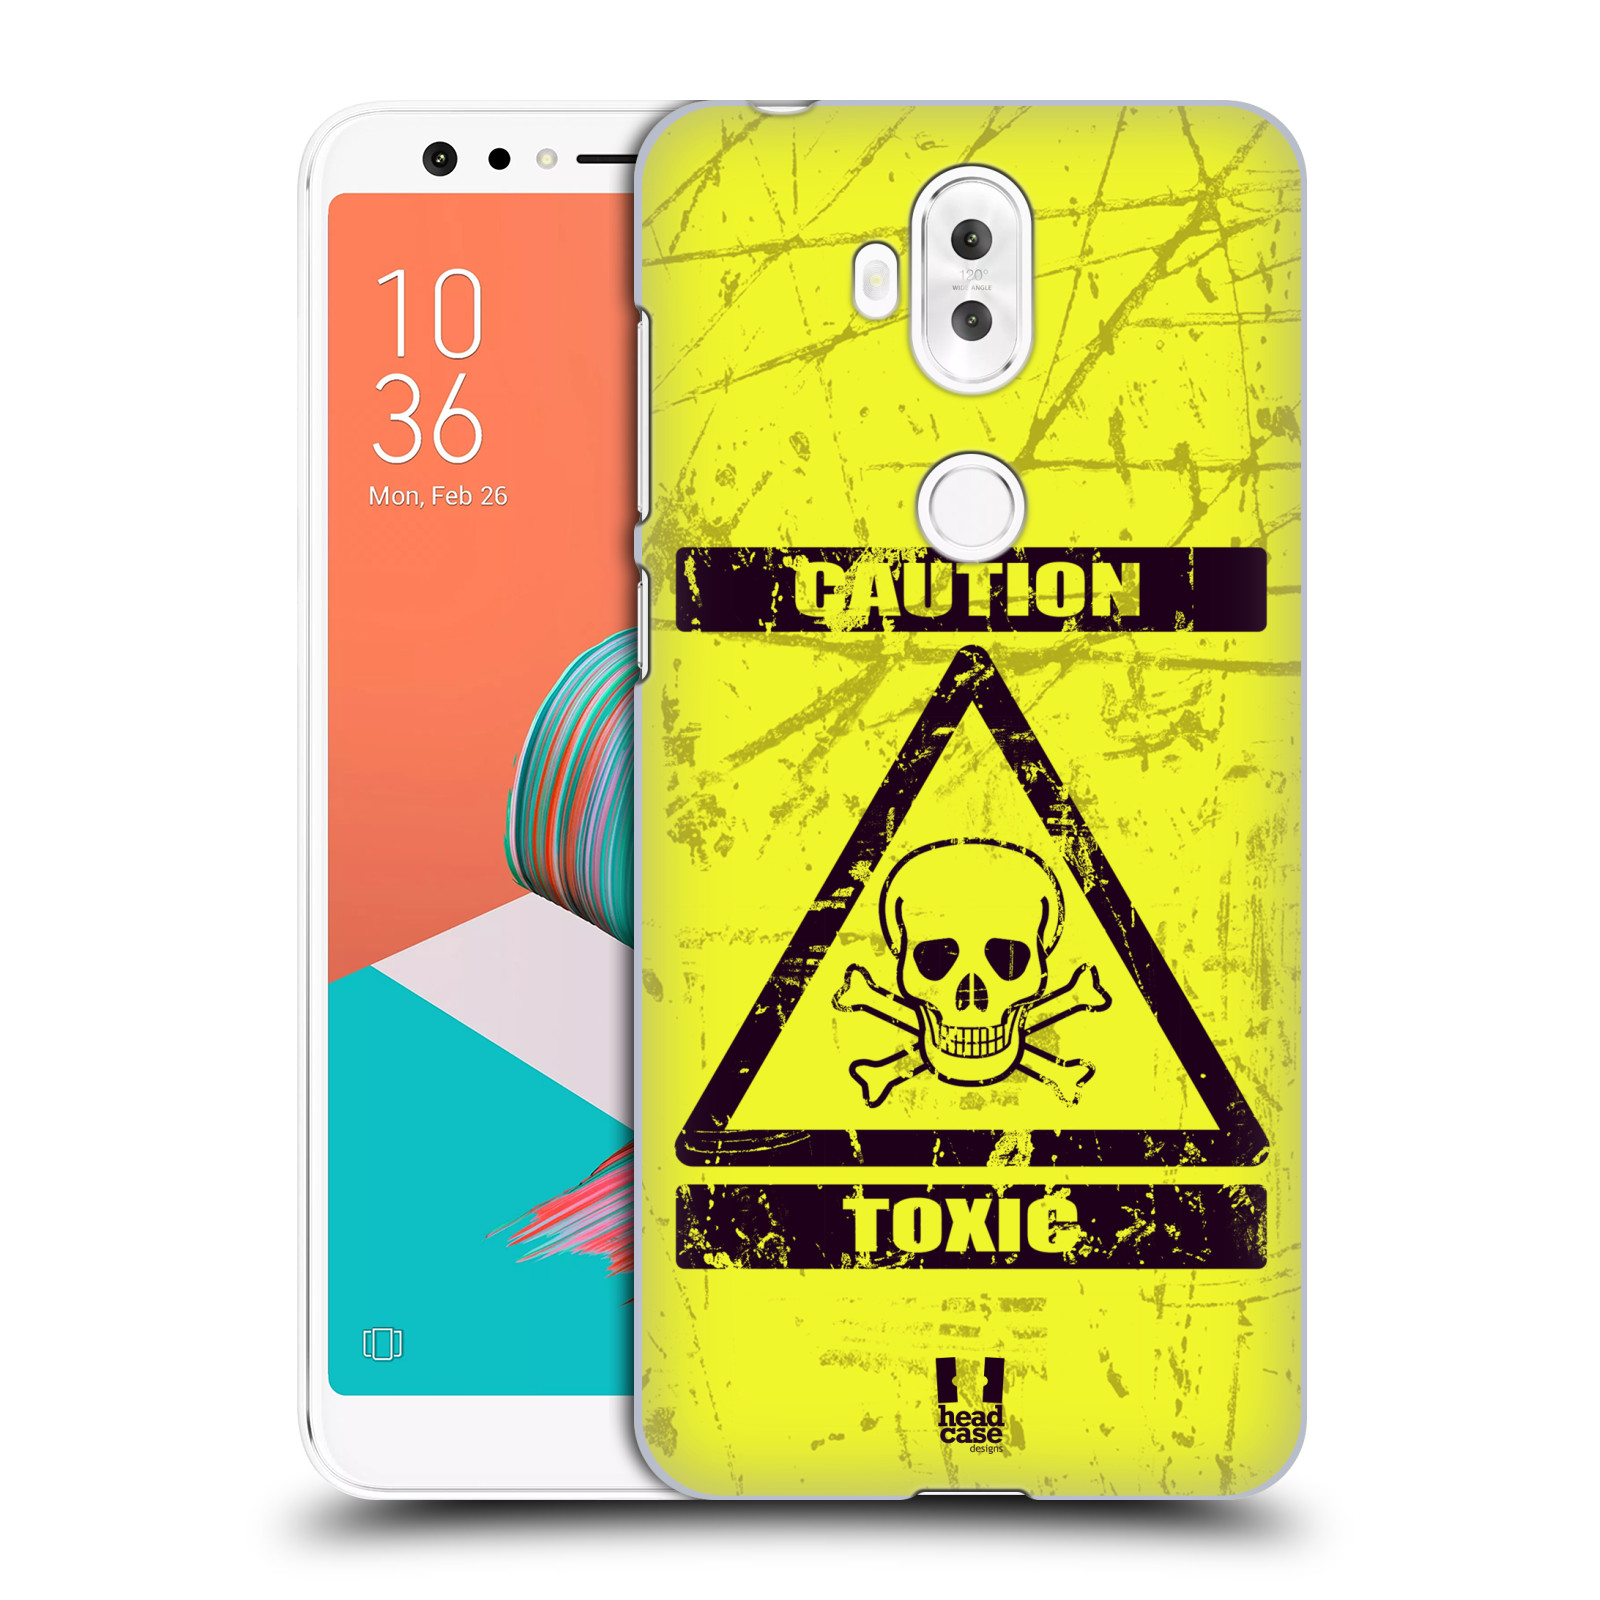 Plastové pouzdro na mobil Asus ZenFone 5 Lite ZC600KL - Head Case - TOXIC (Plastový kryt či obal na mobilní telefon Asus ZenFone 5 Lite (ZC600KL) s motivem TOXIC)